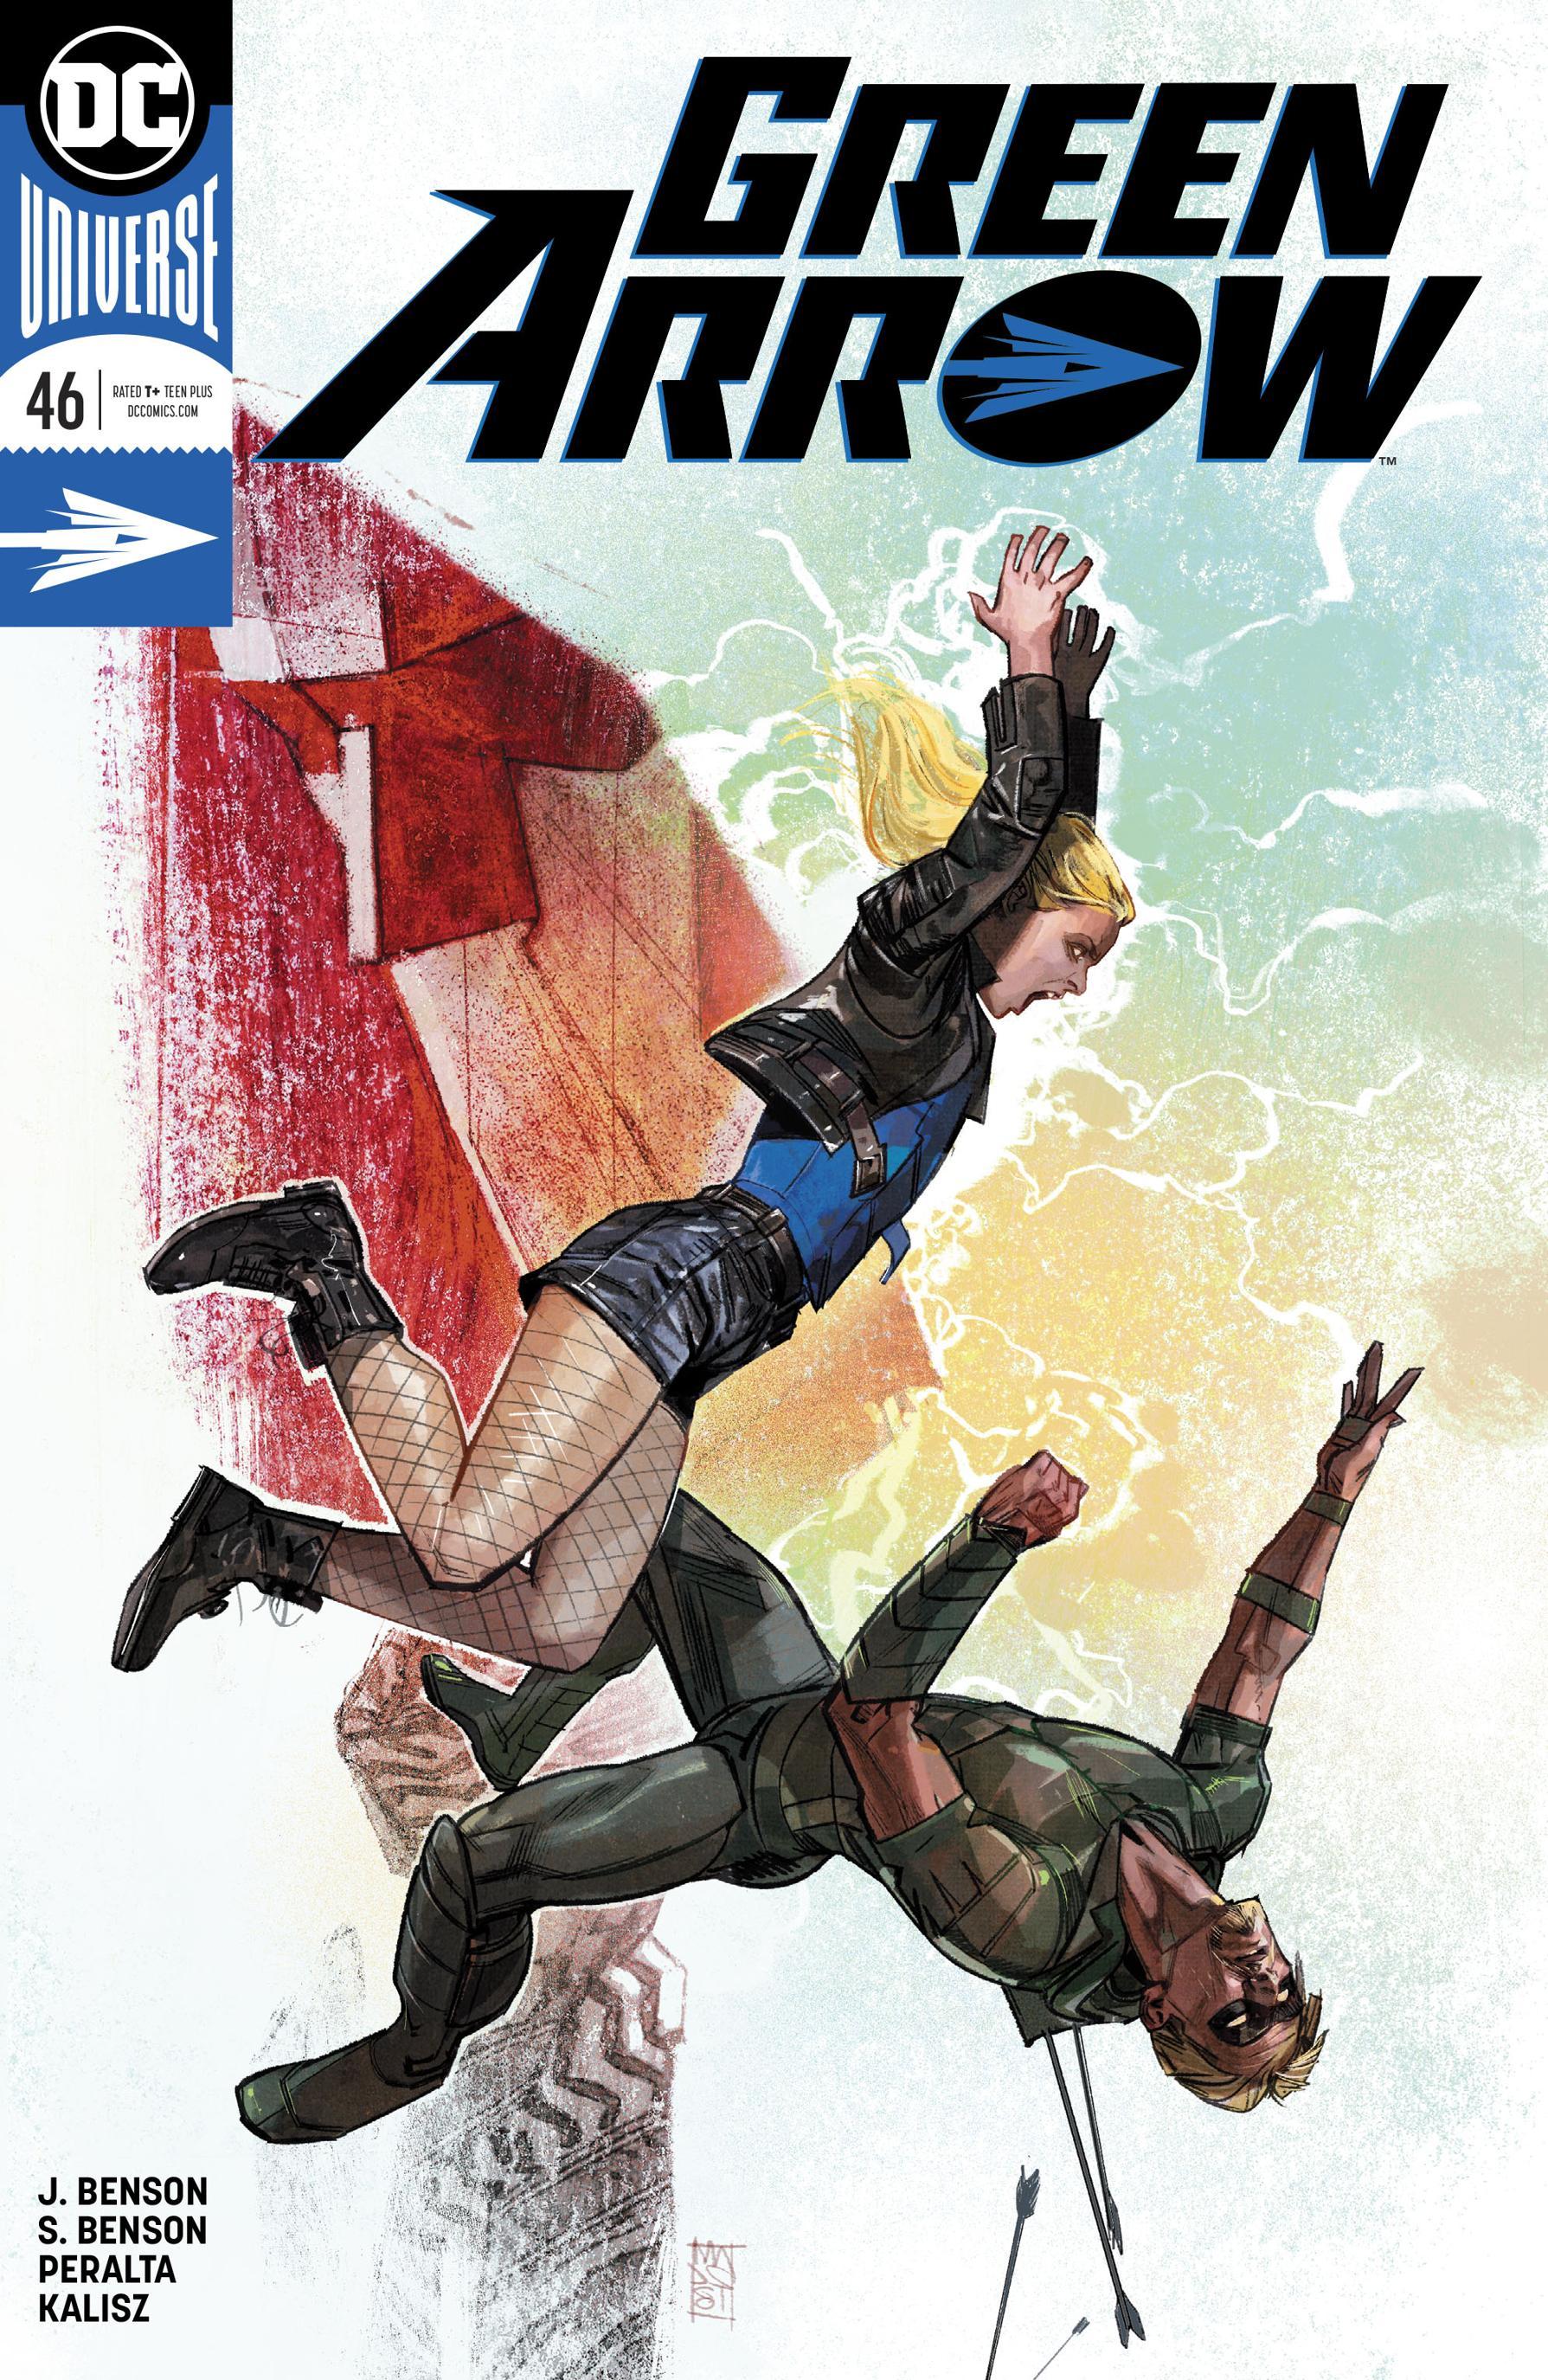 Green Arrow 046 2019 2 covers Digital Zone